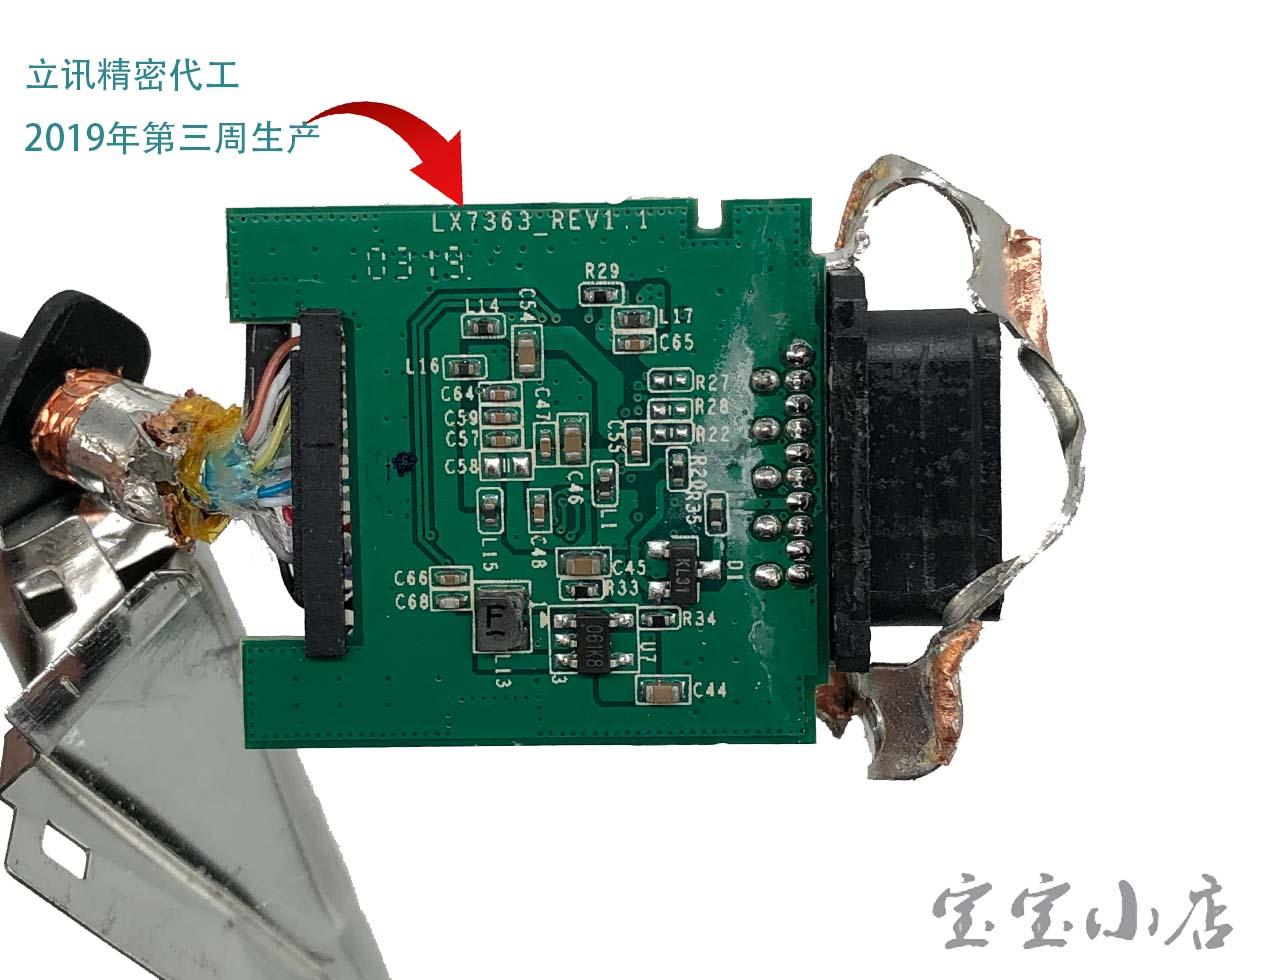 联想Lenovo HDMI to VGA Monitor Adapter转换头 线 转接器CH7101B-BF 图形卡芯片 FRU:03X6574 03X7384